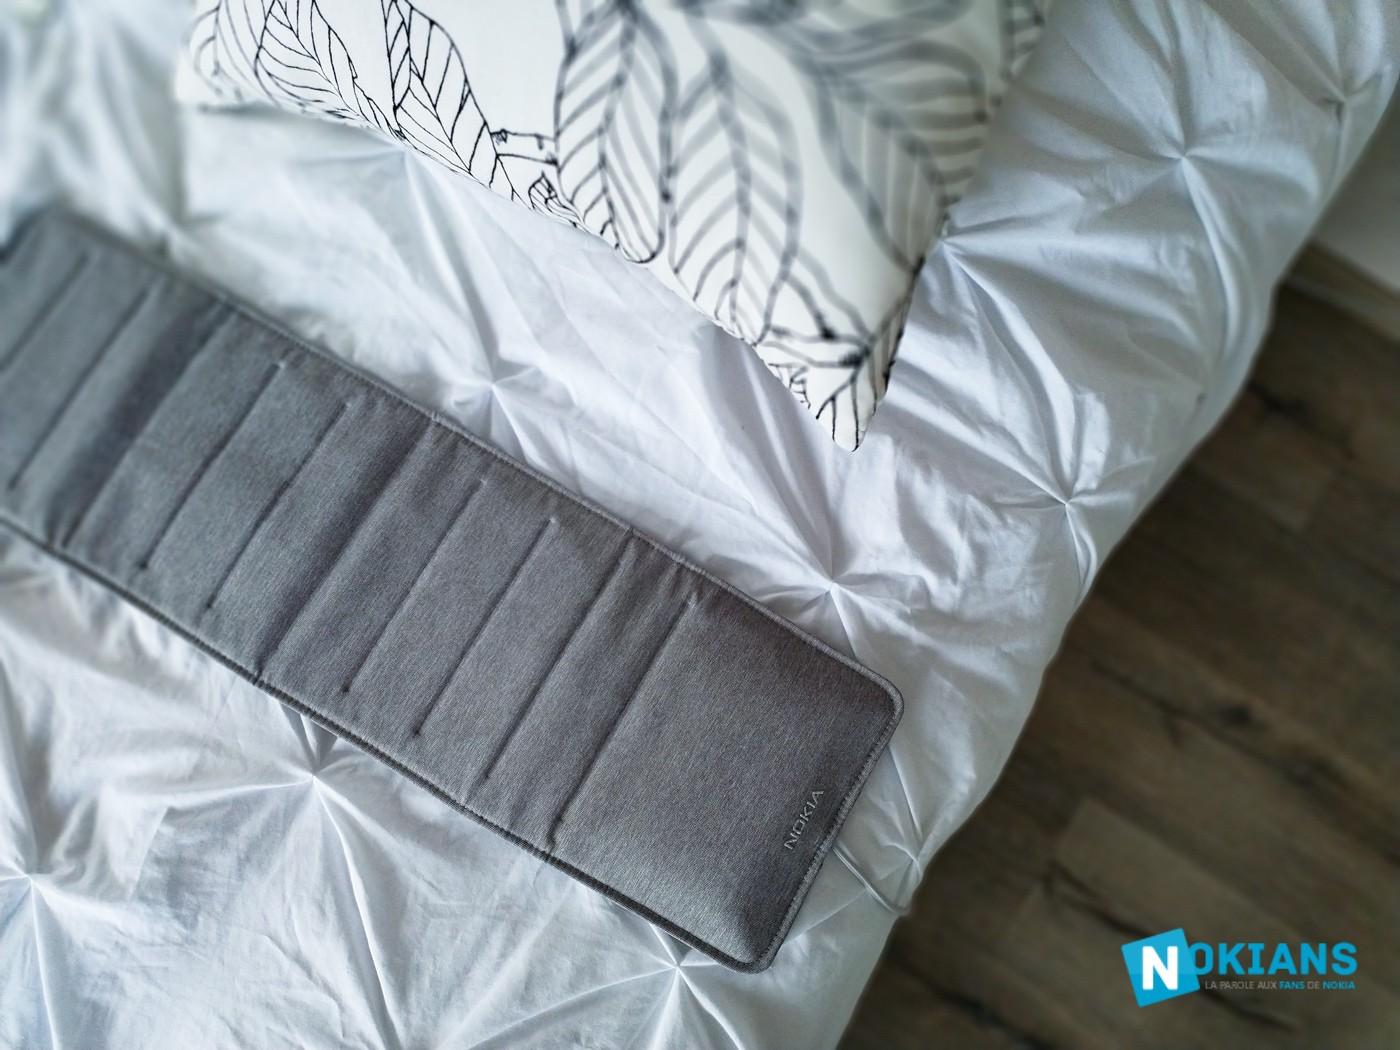 nokia-sleep-test-11